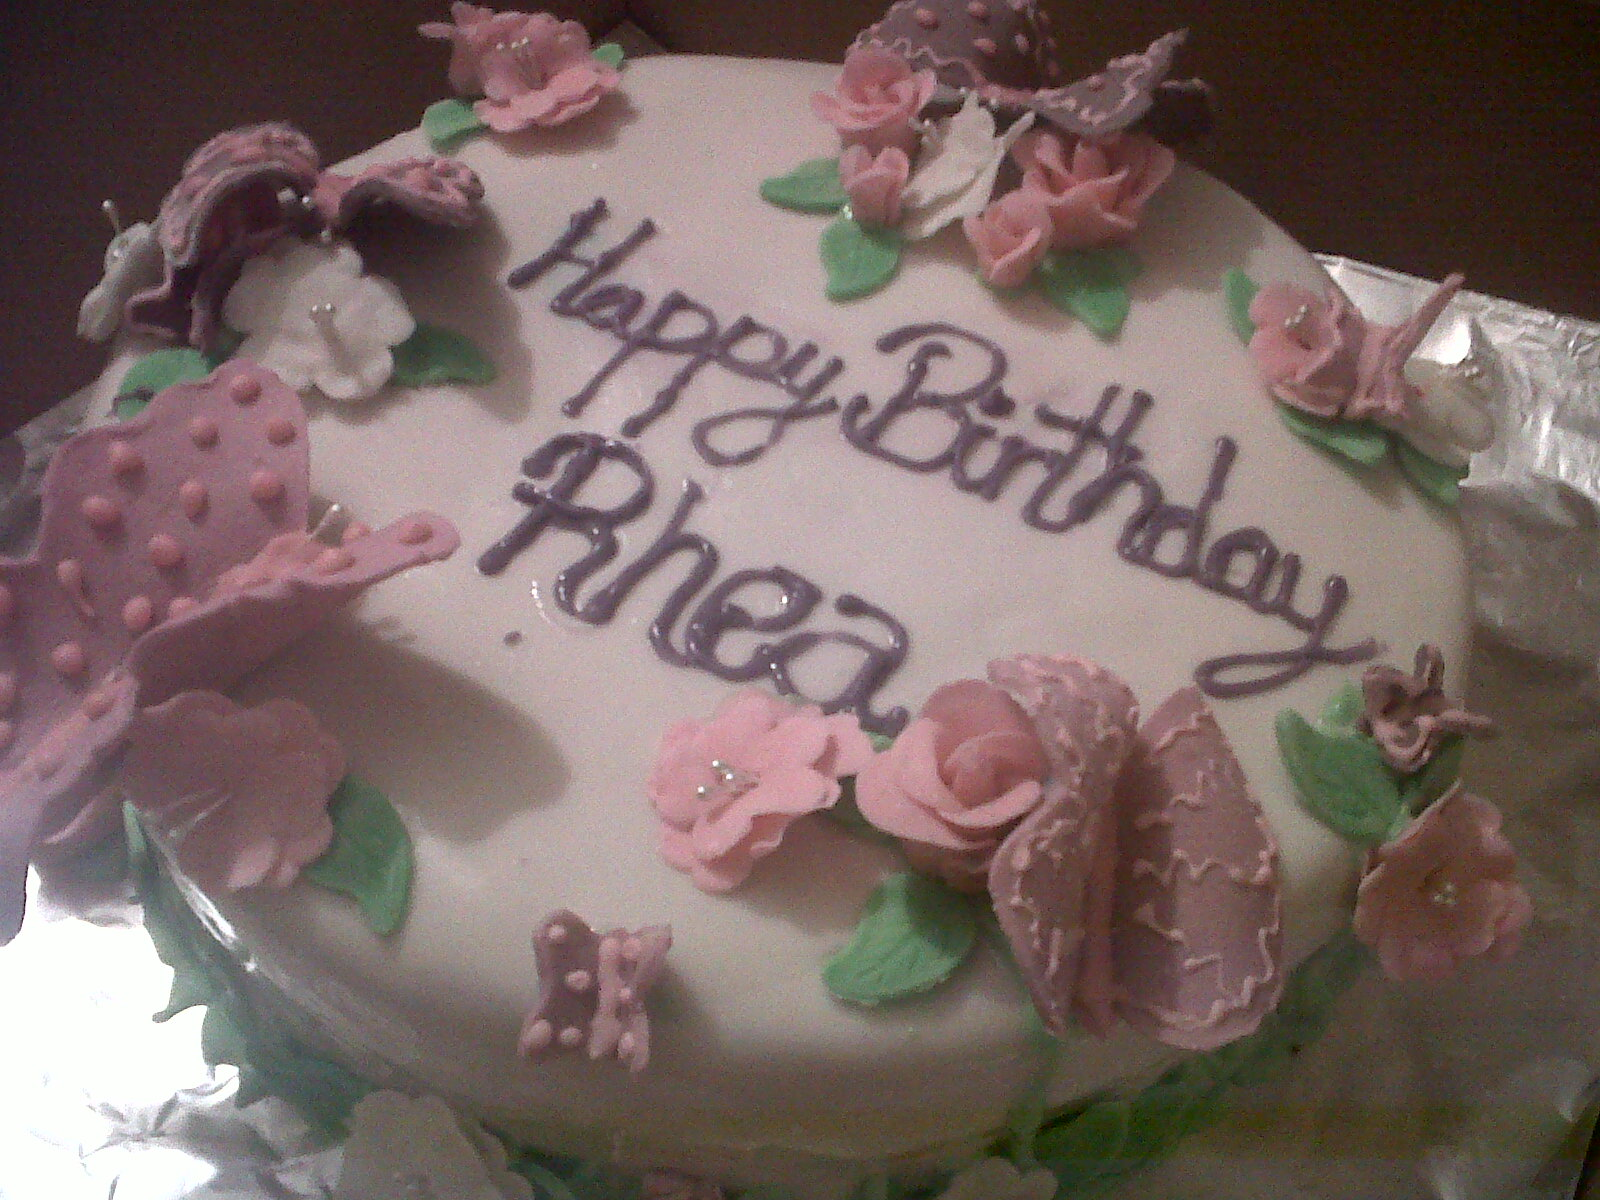 The Cake Bake Shoppe